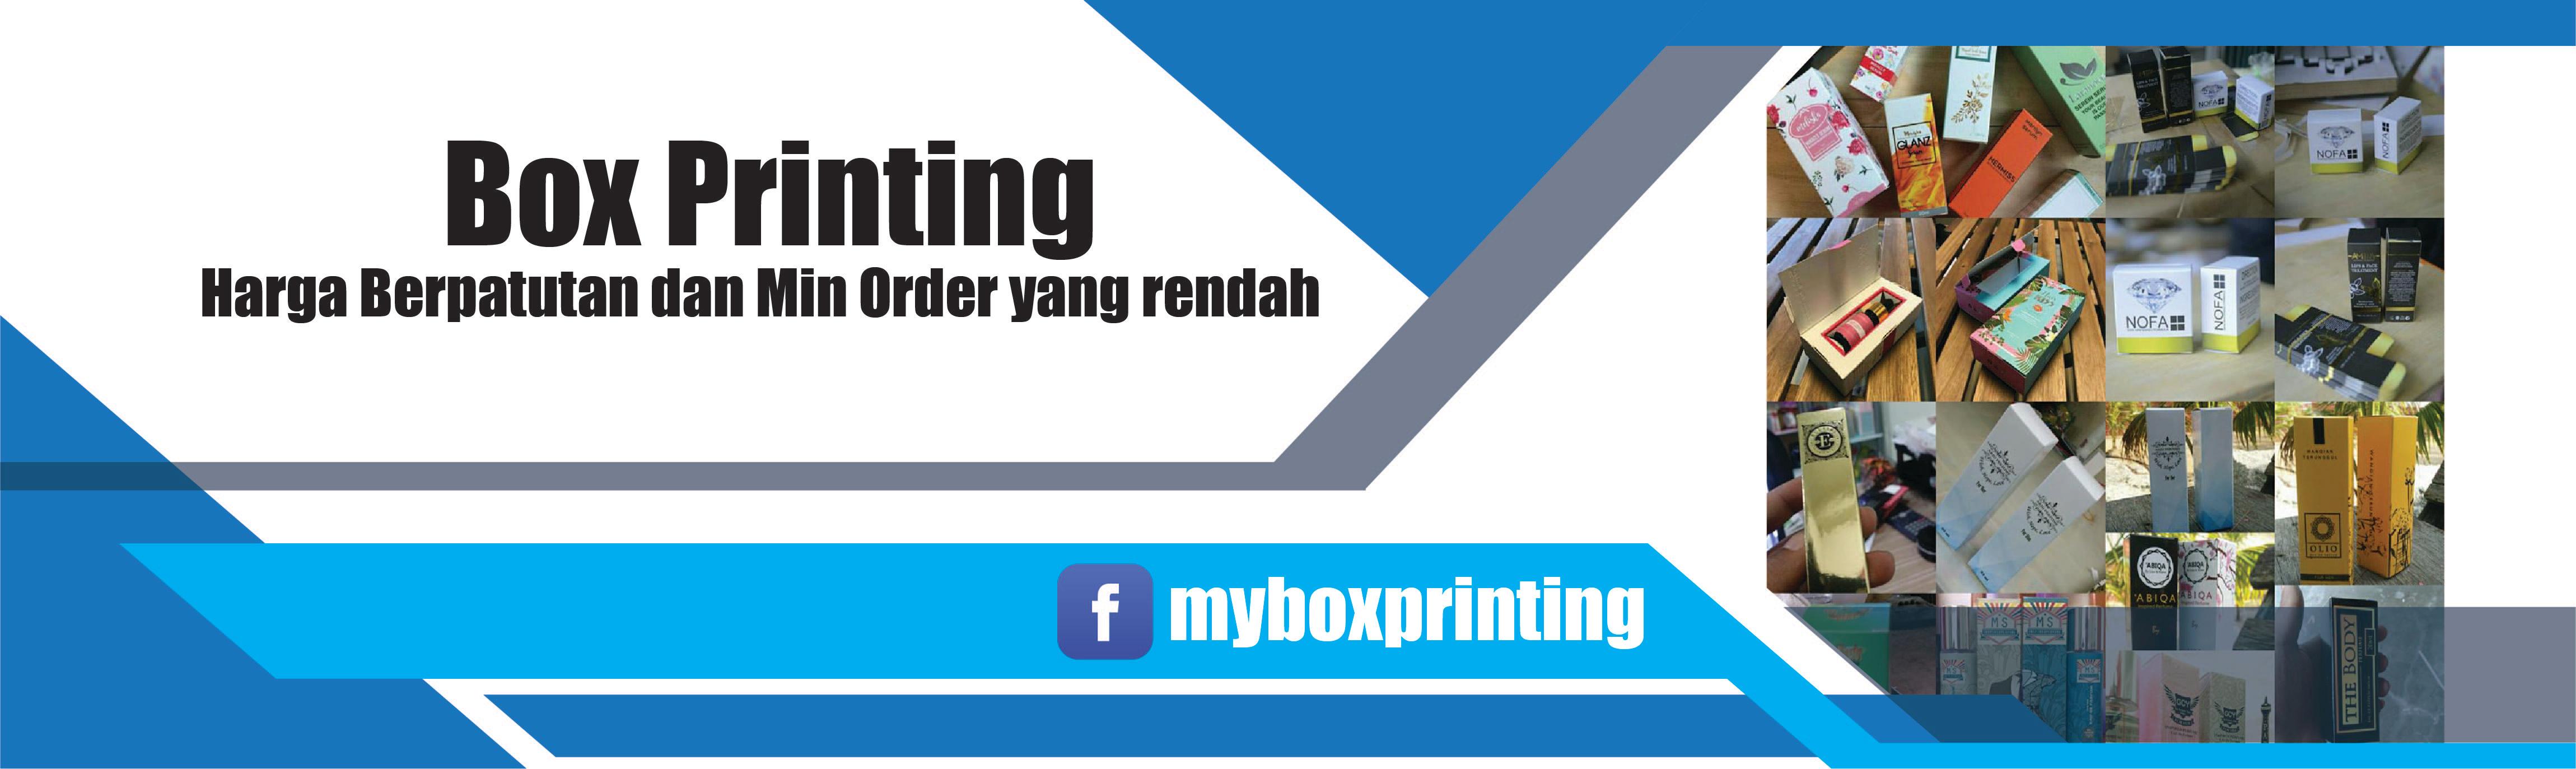 box printing-01